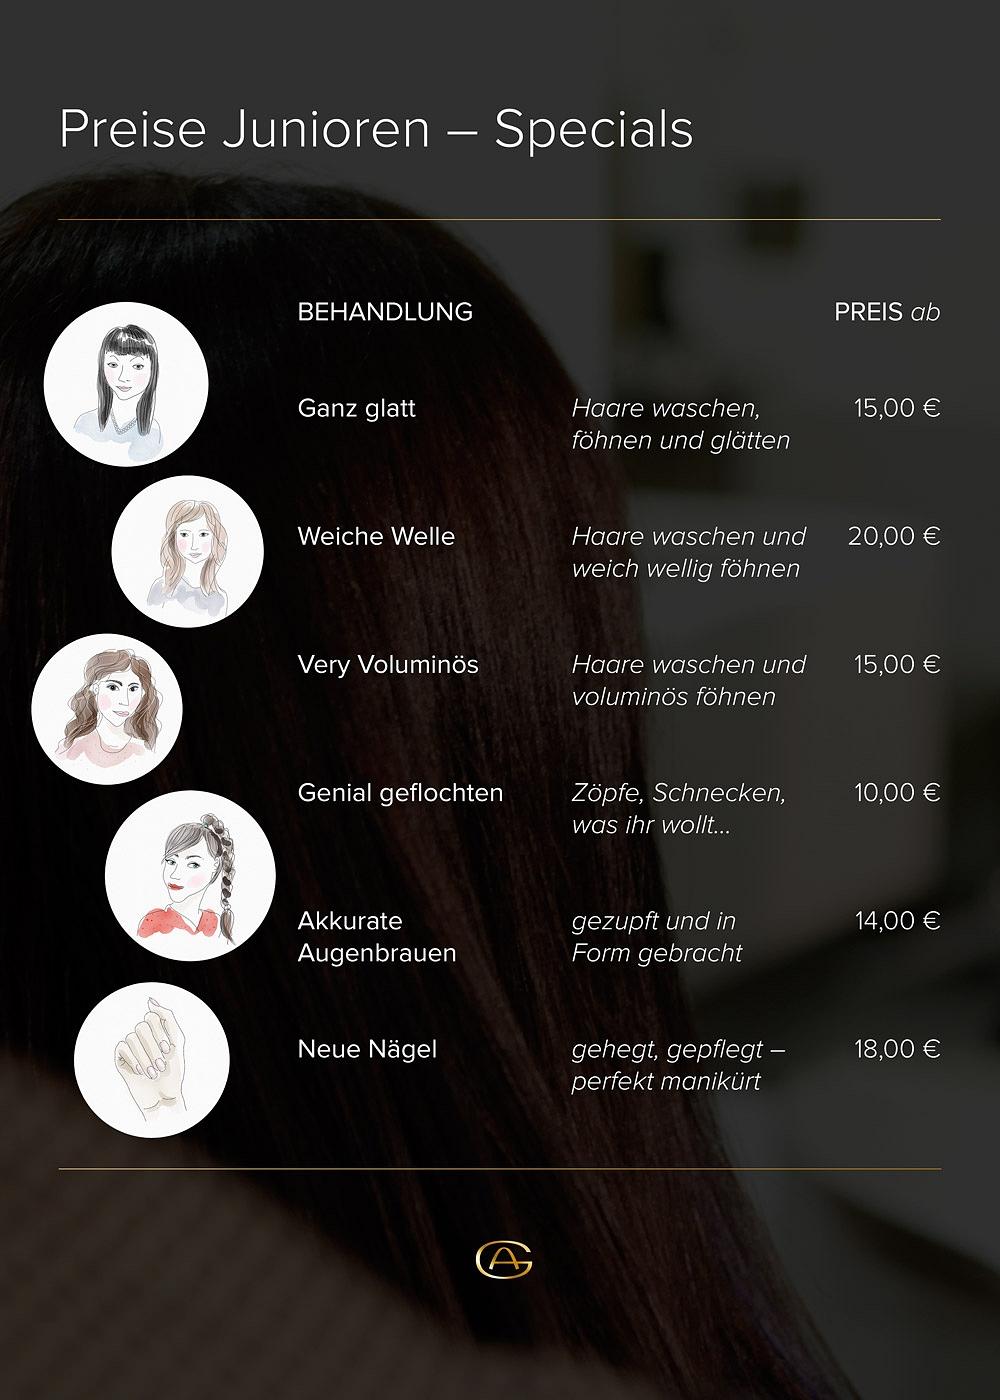 garzareck_coiffeur_preise_junior_specials_web01.jpg